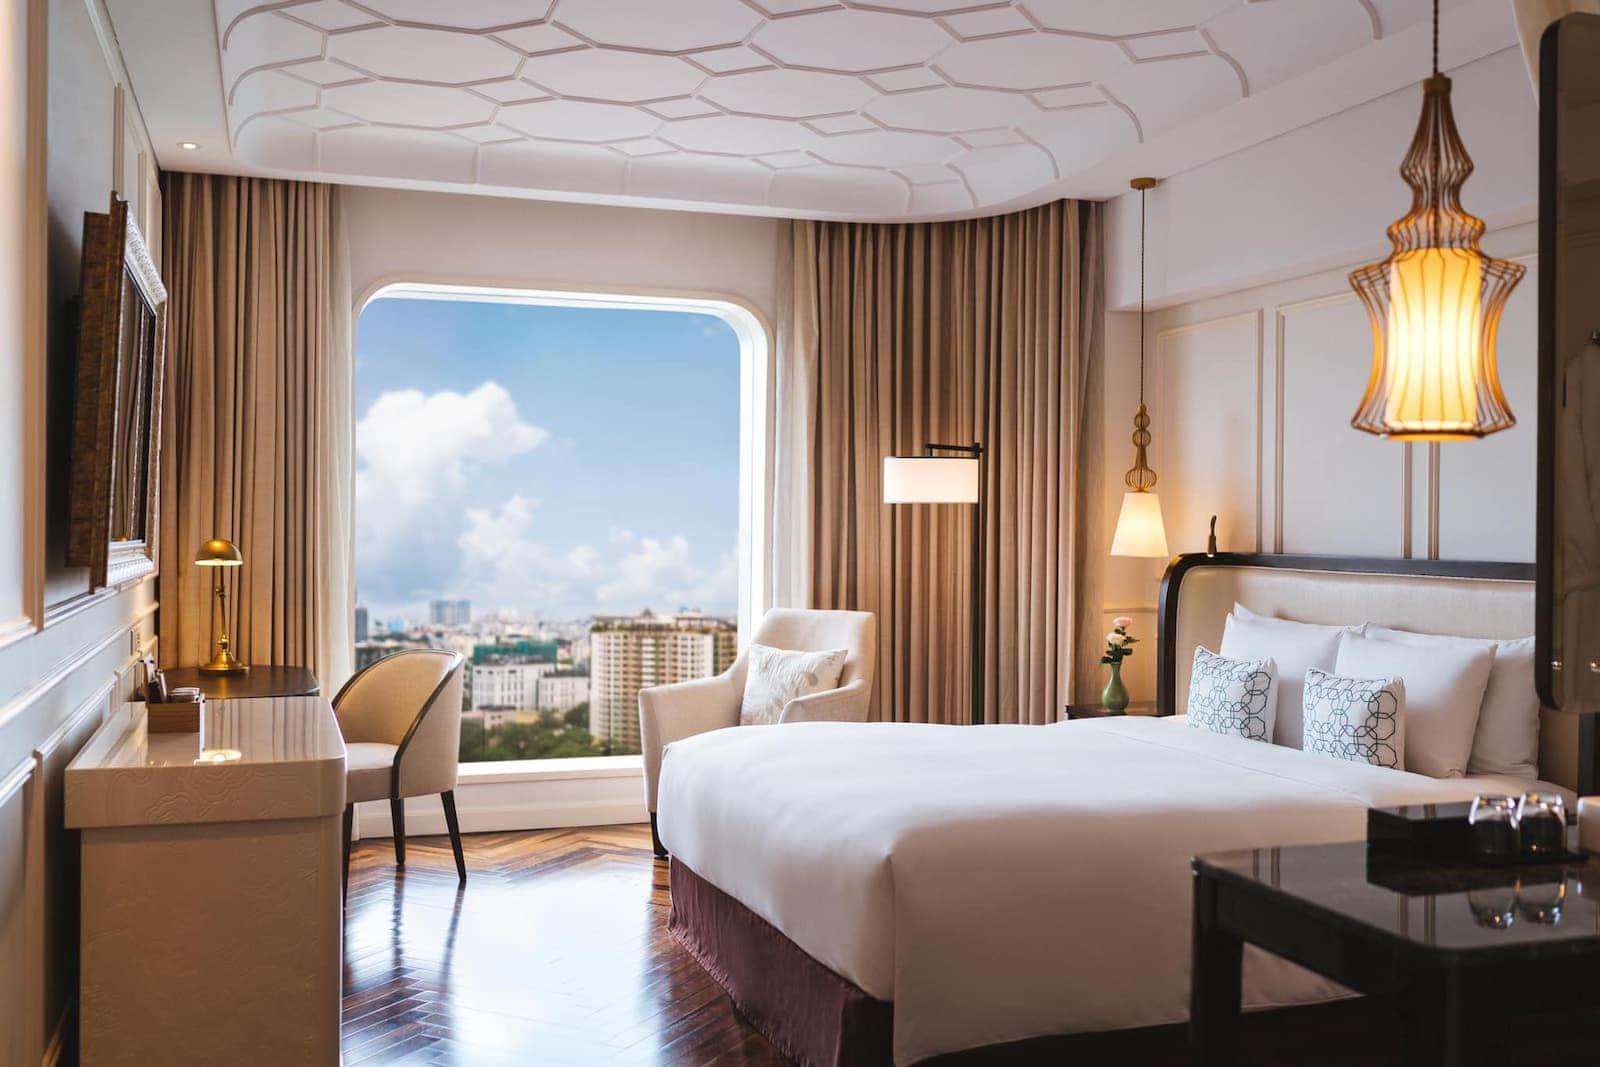 Image of the Hotel Des Arts Saigon in Ho Chi Minh City, Vietnam